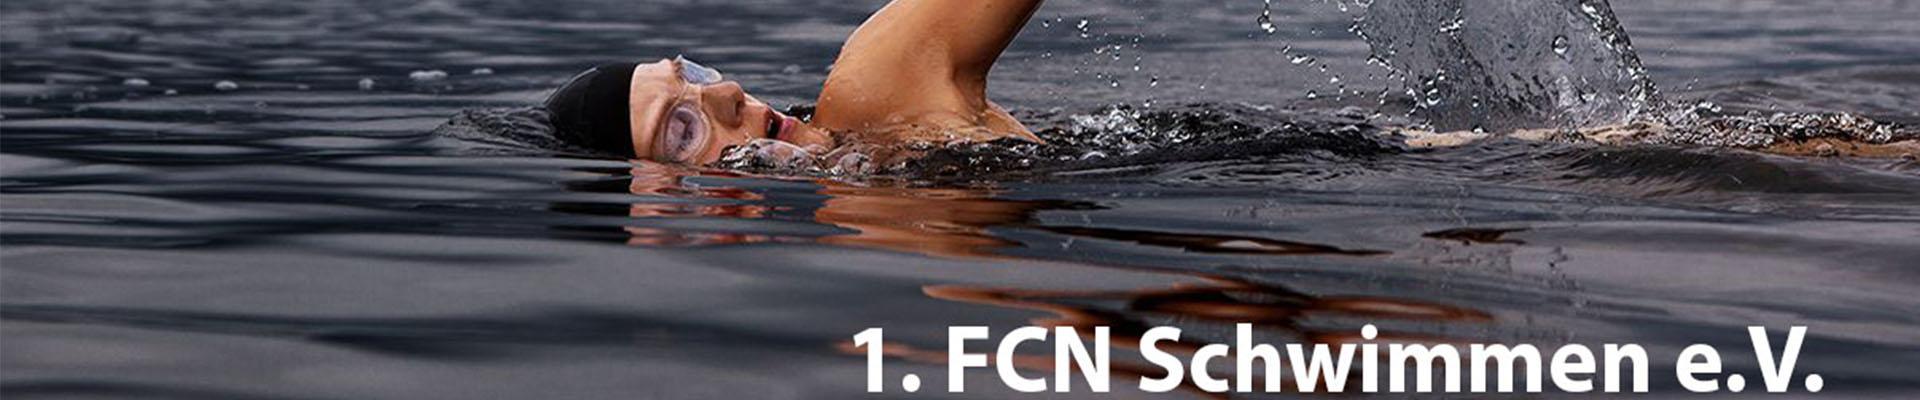 1. FCN Schwimmen e.V.